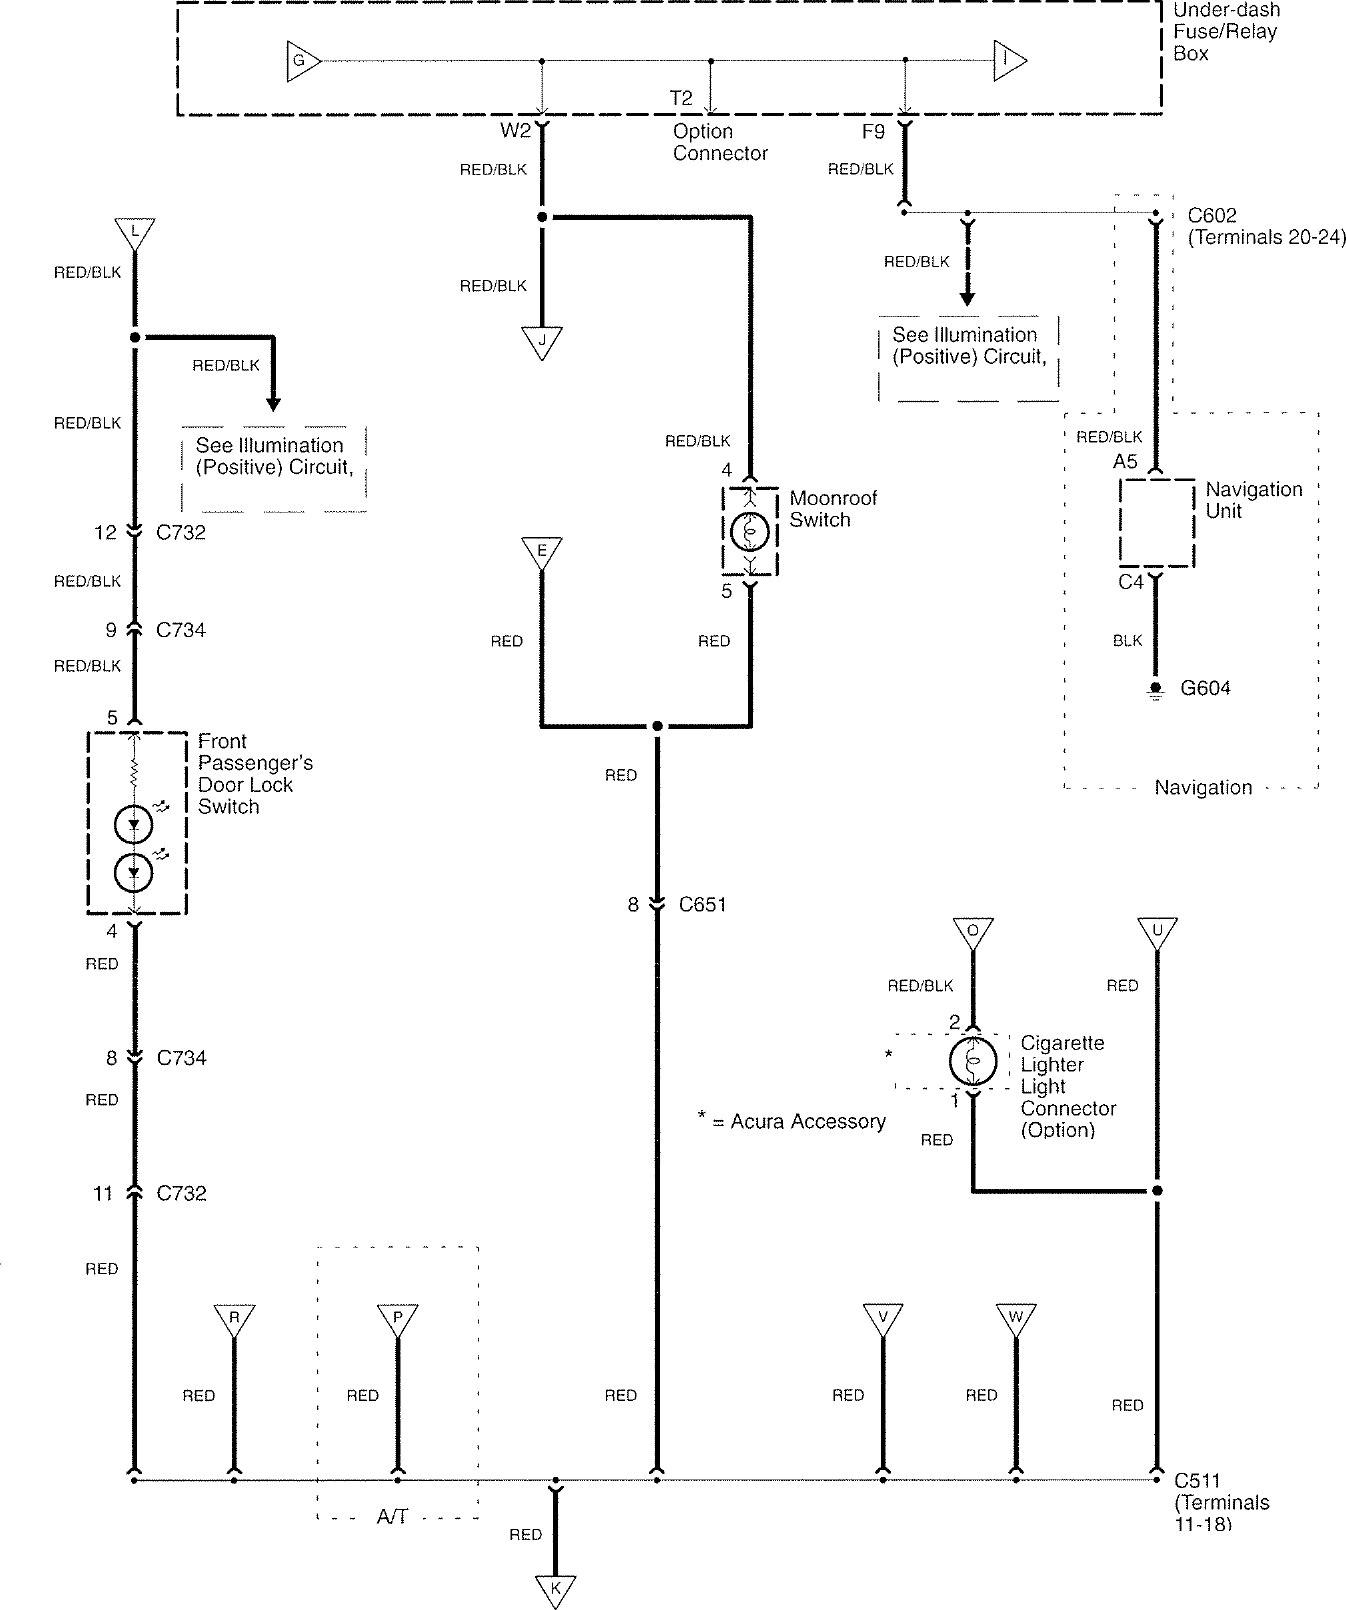 Acura Tl 2007 Wiring Diagrams Interior Lighting Carknowledge 2008 Civic Diagram Part 6